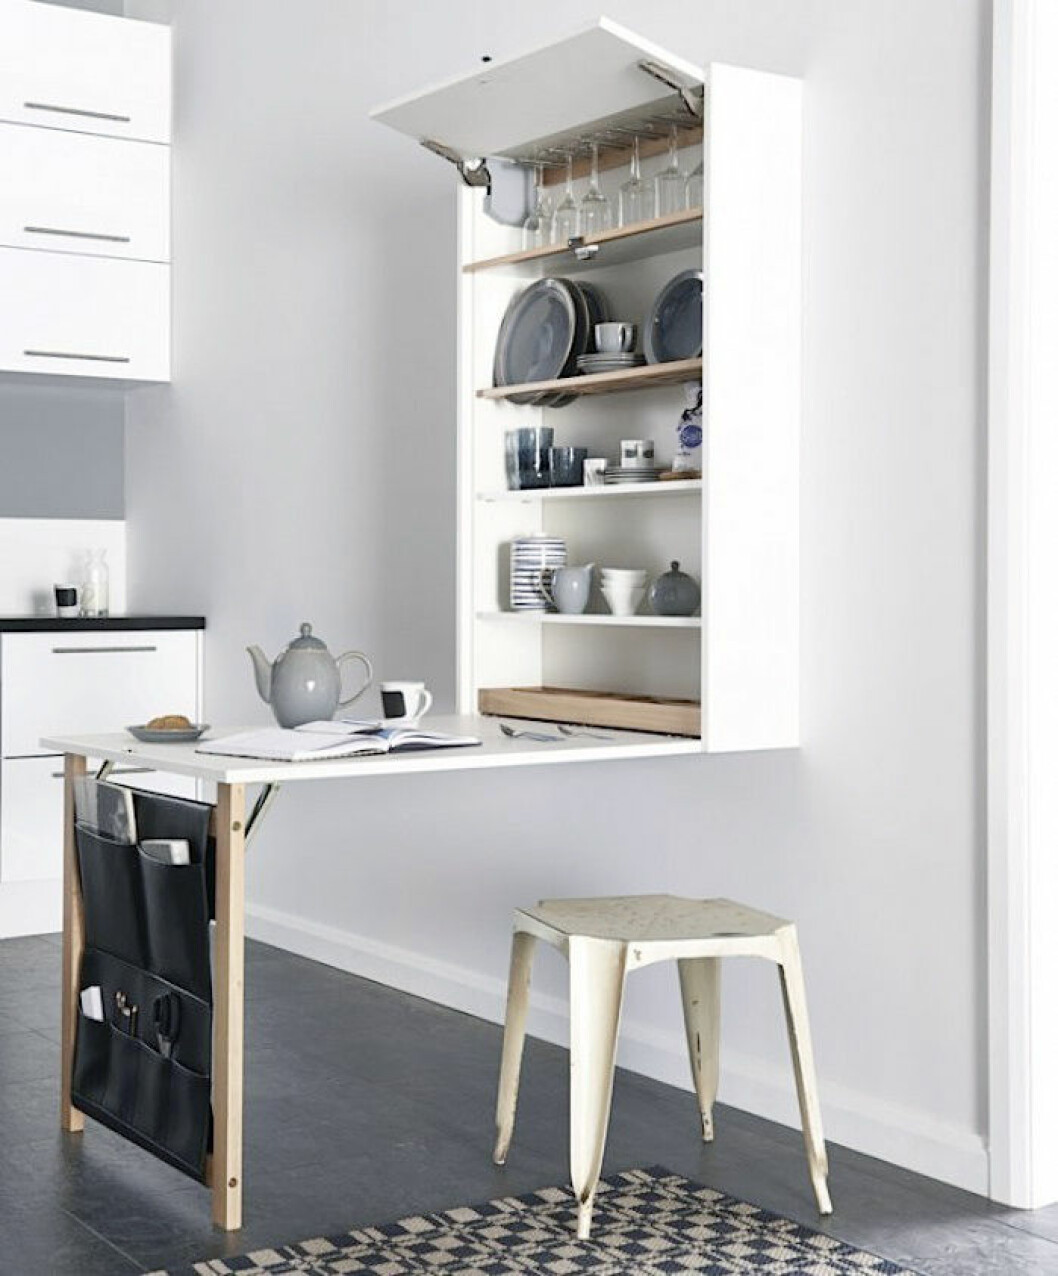 03. compact-kitchen2